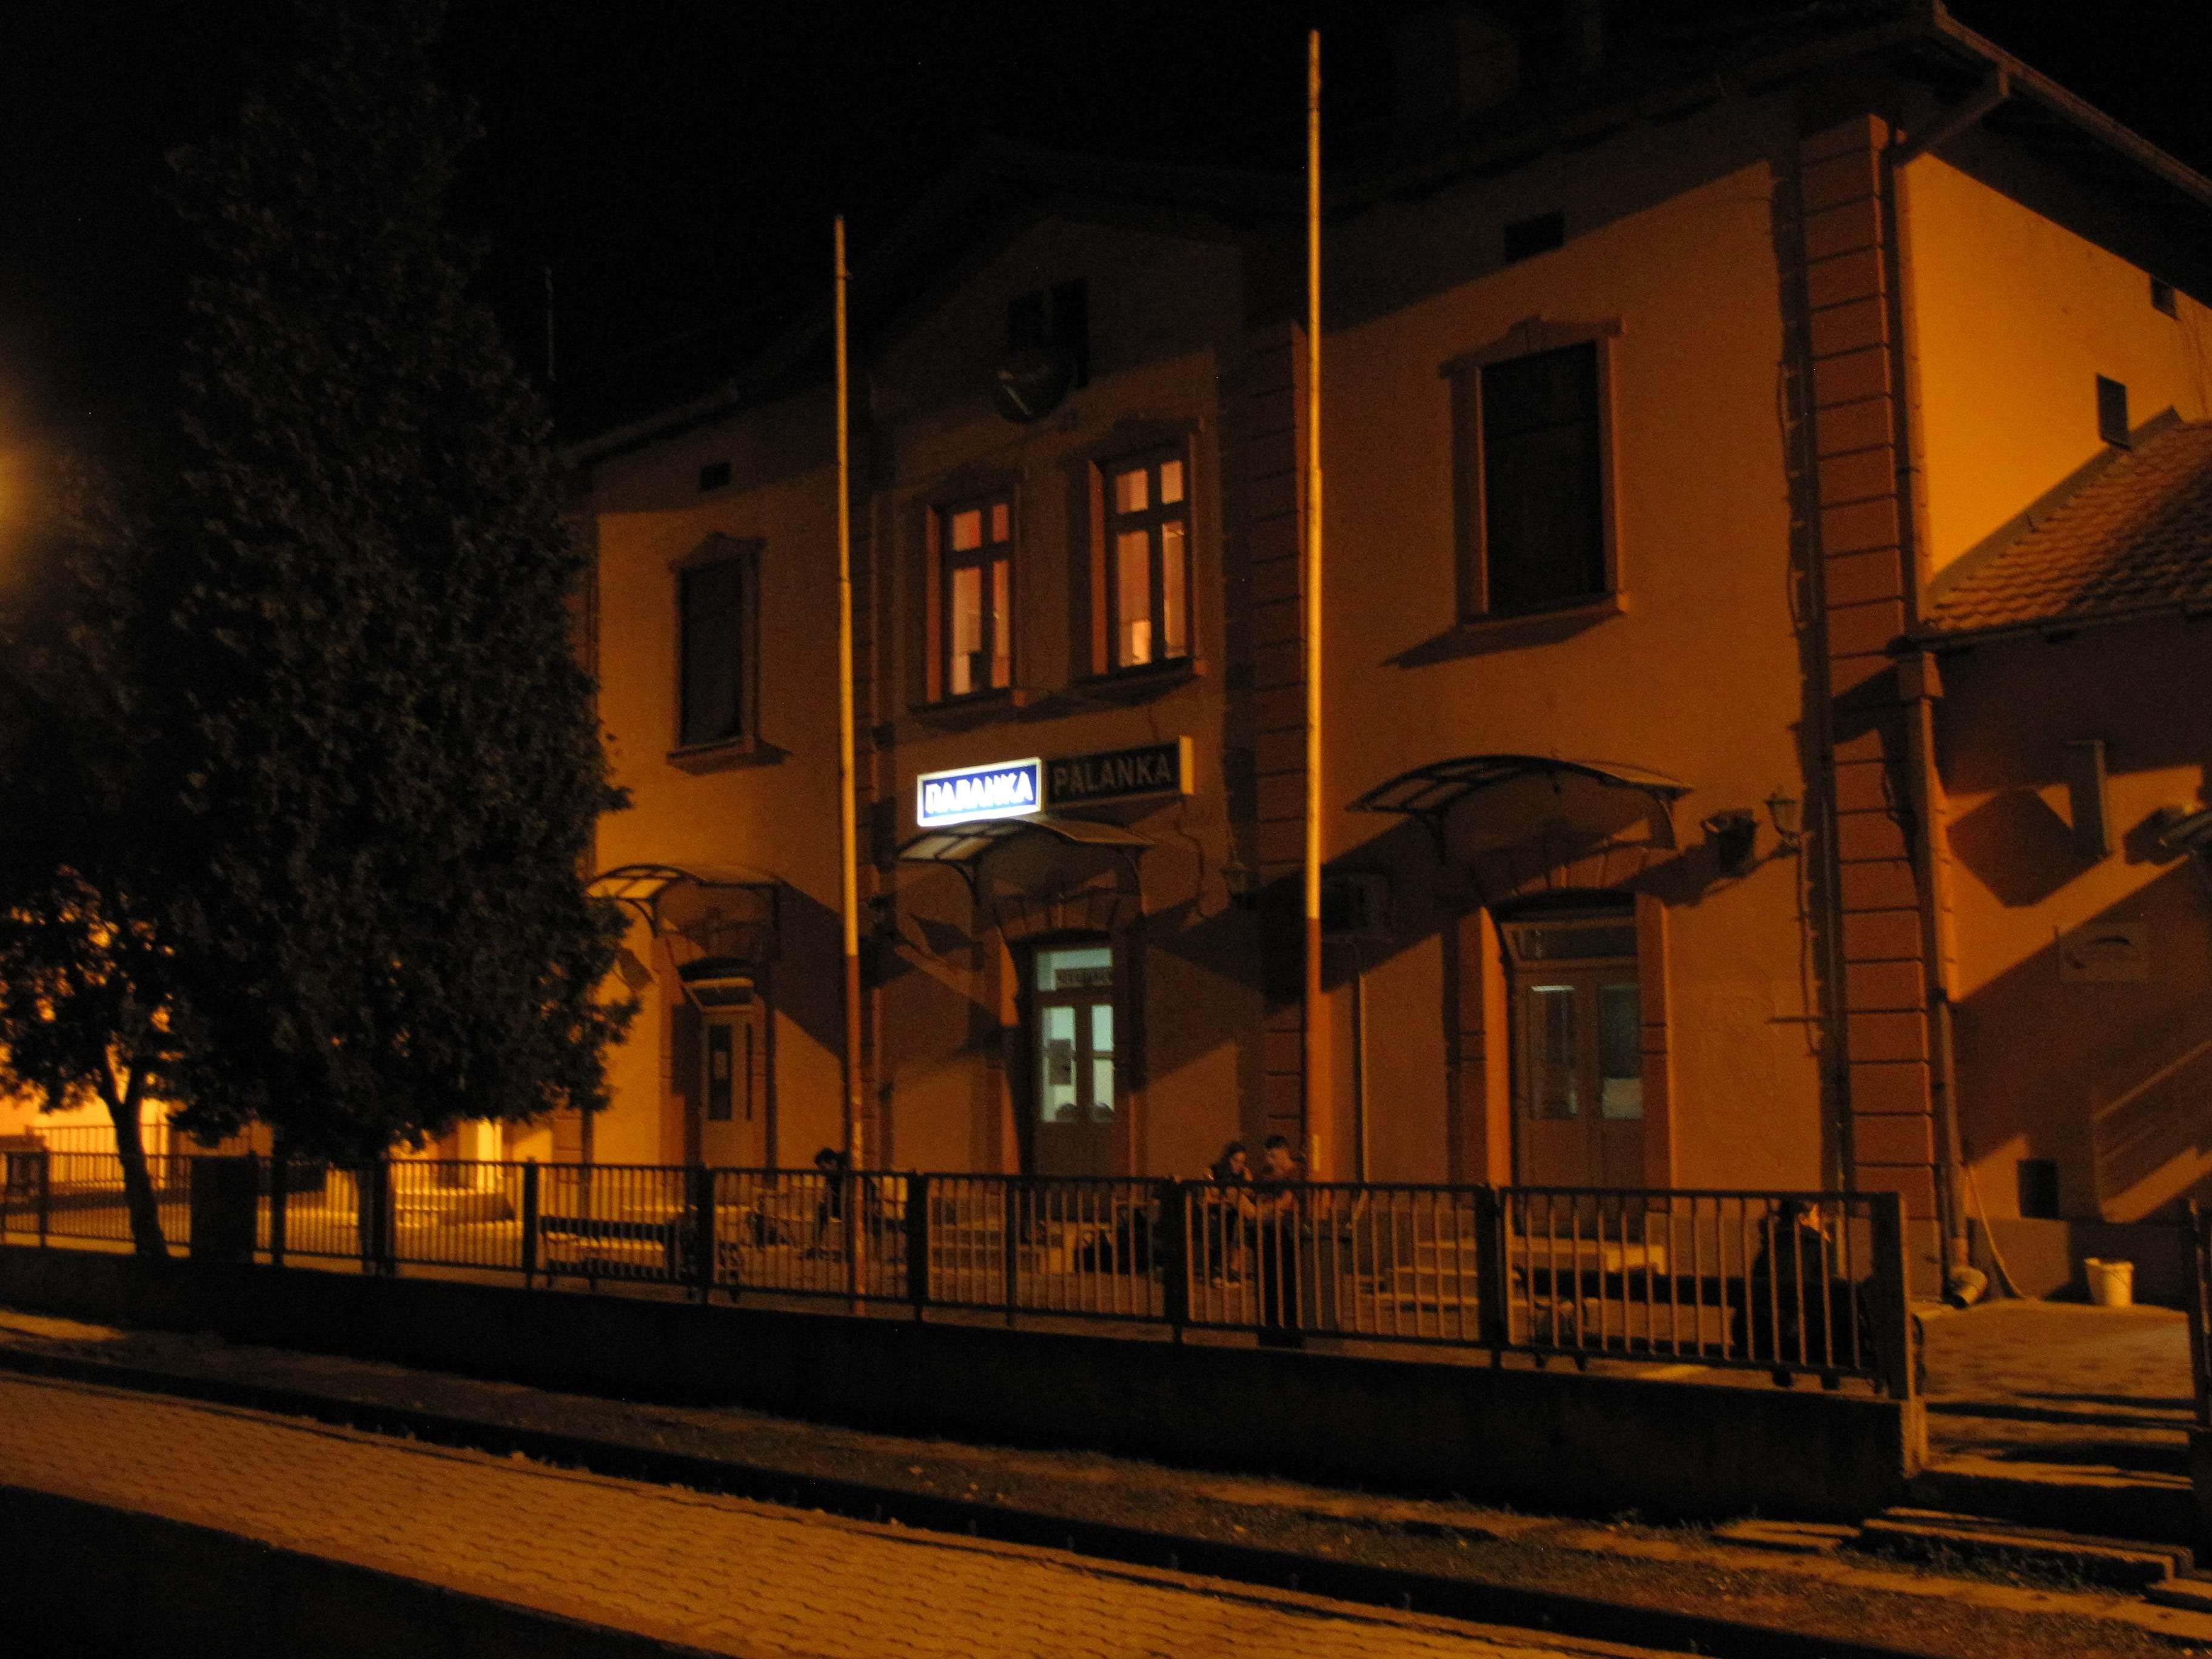 Palanka Railway station